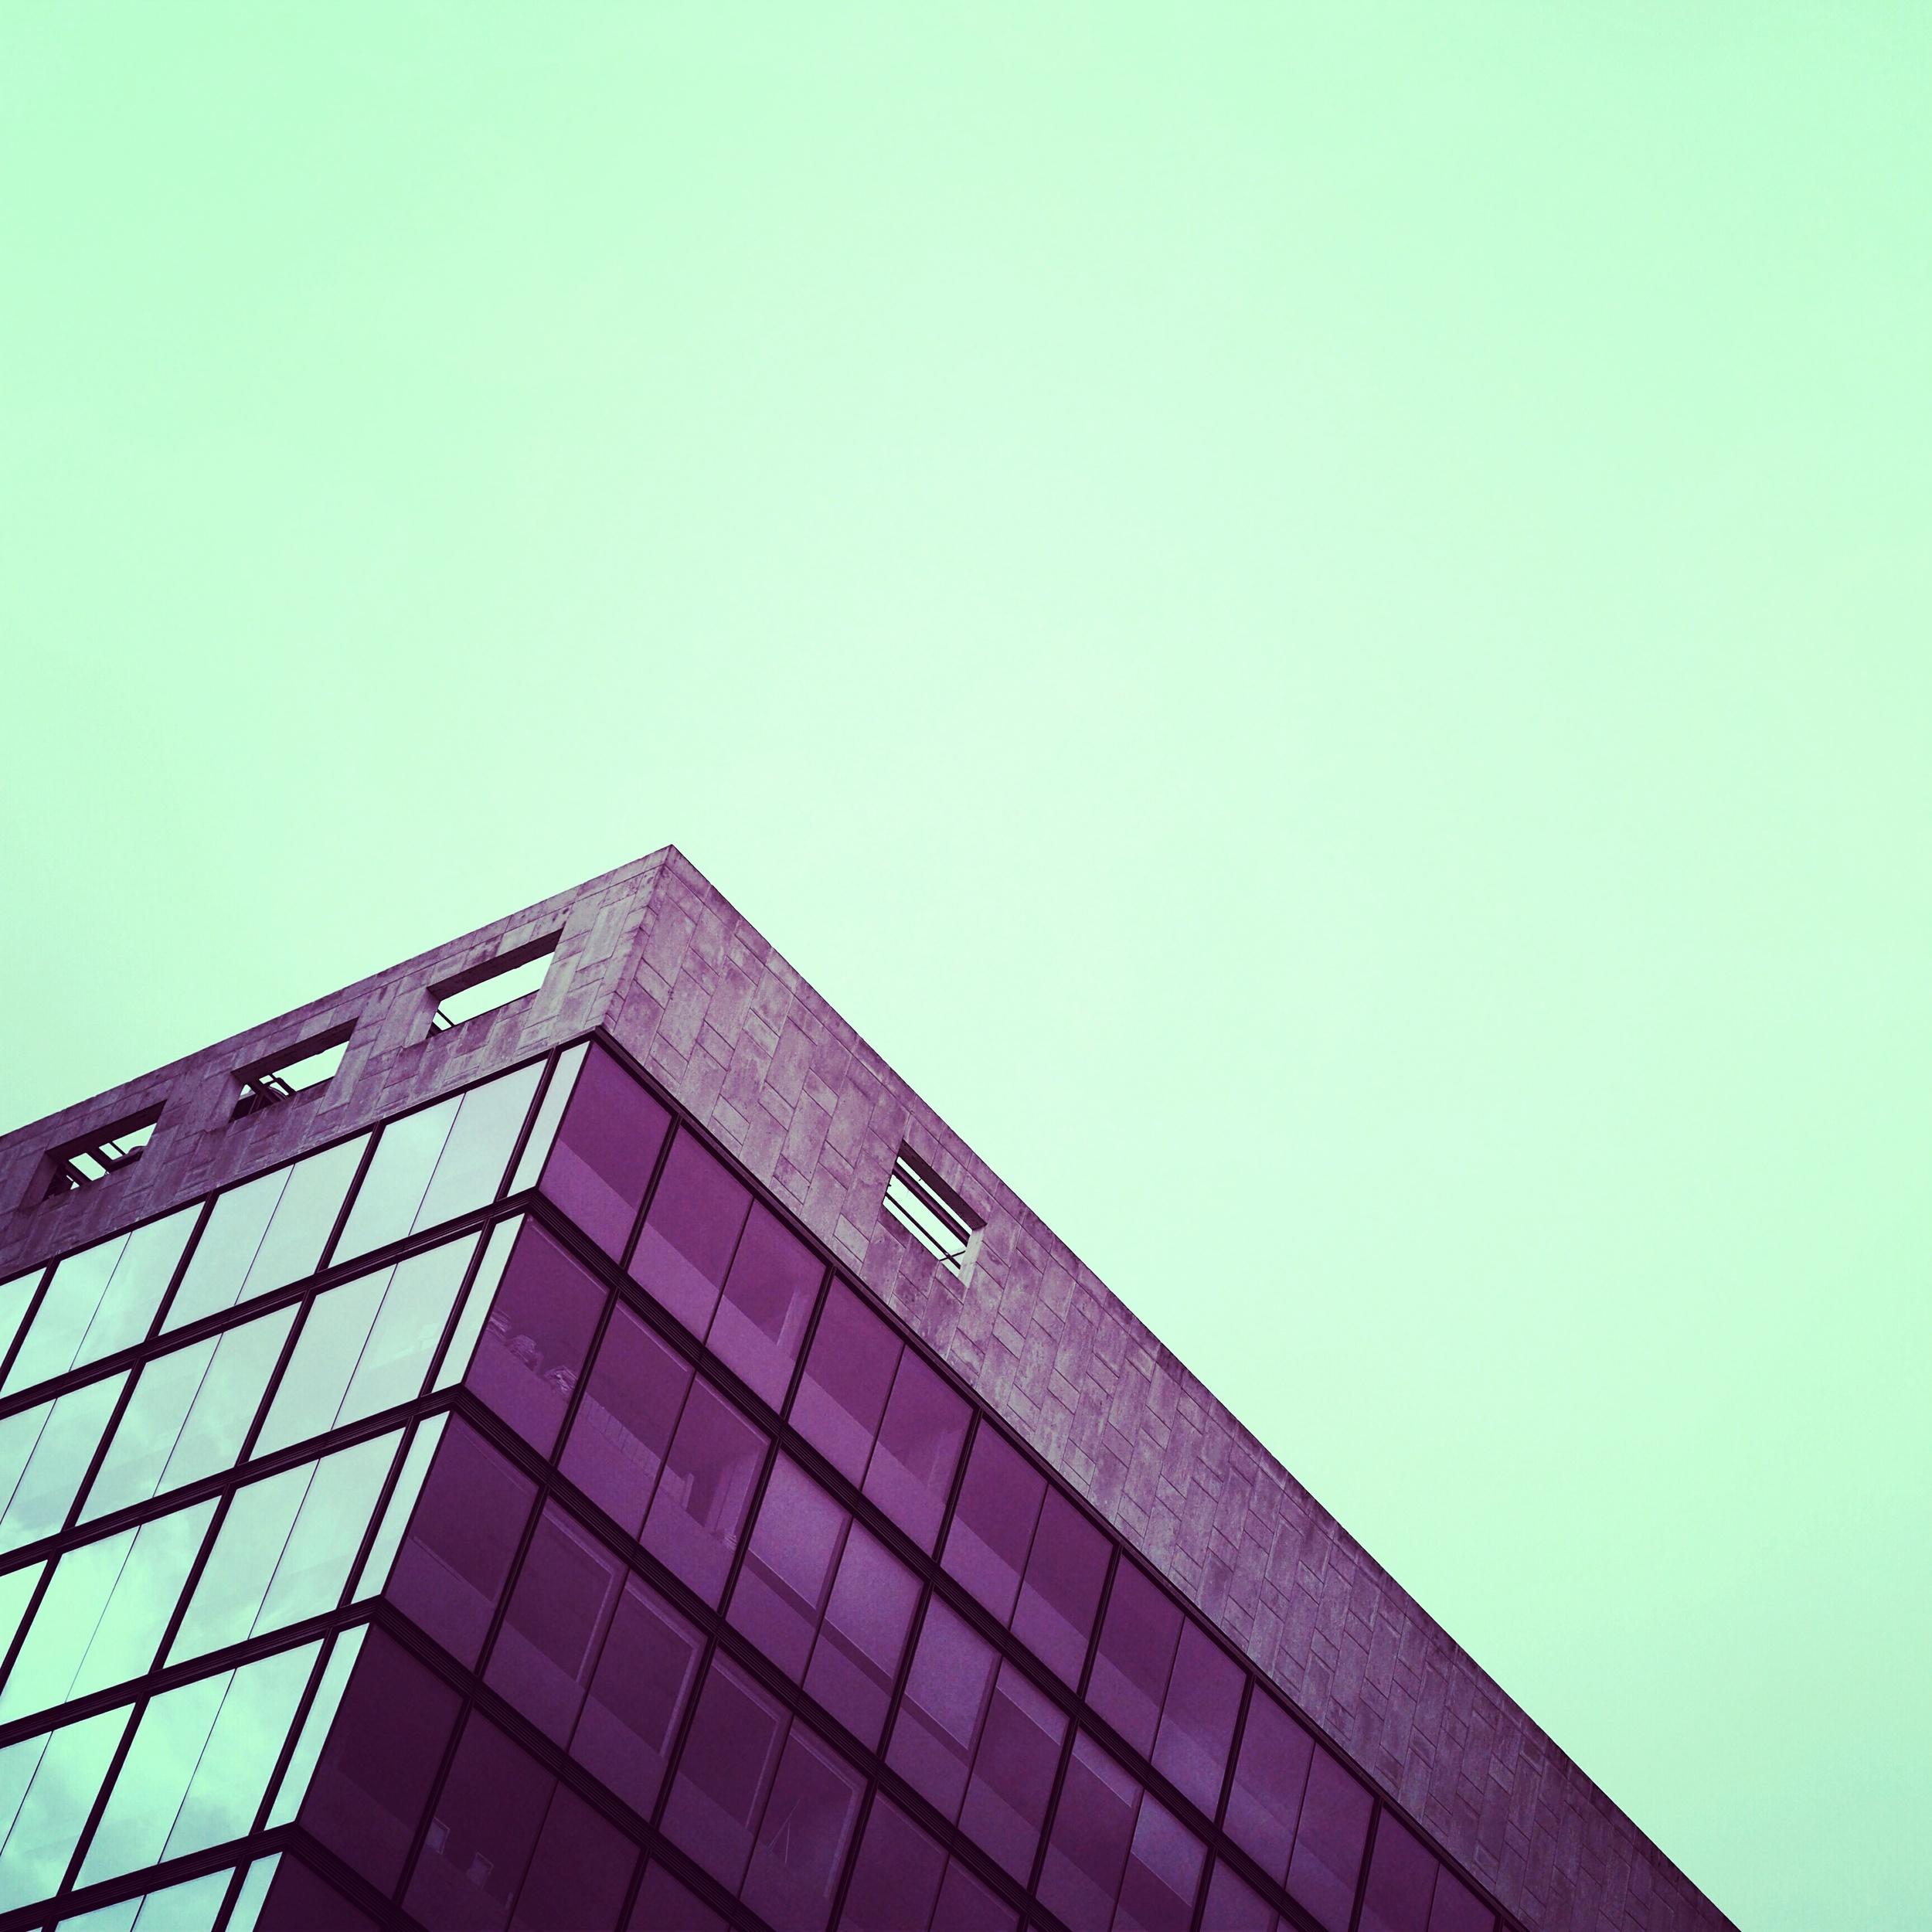 minimal architecture photography